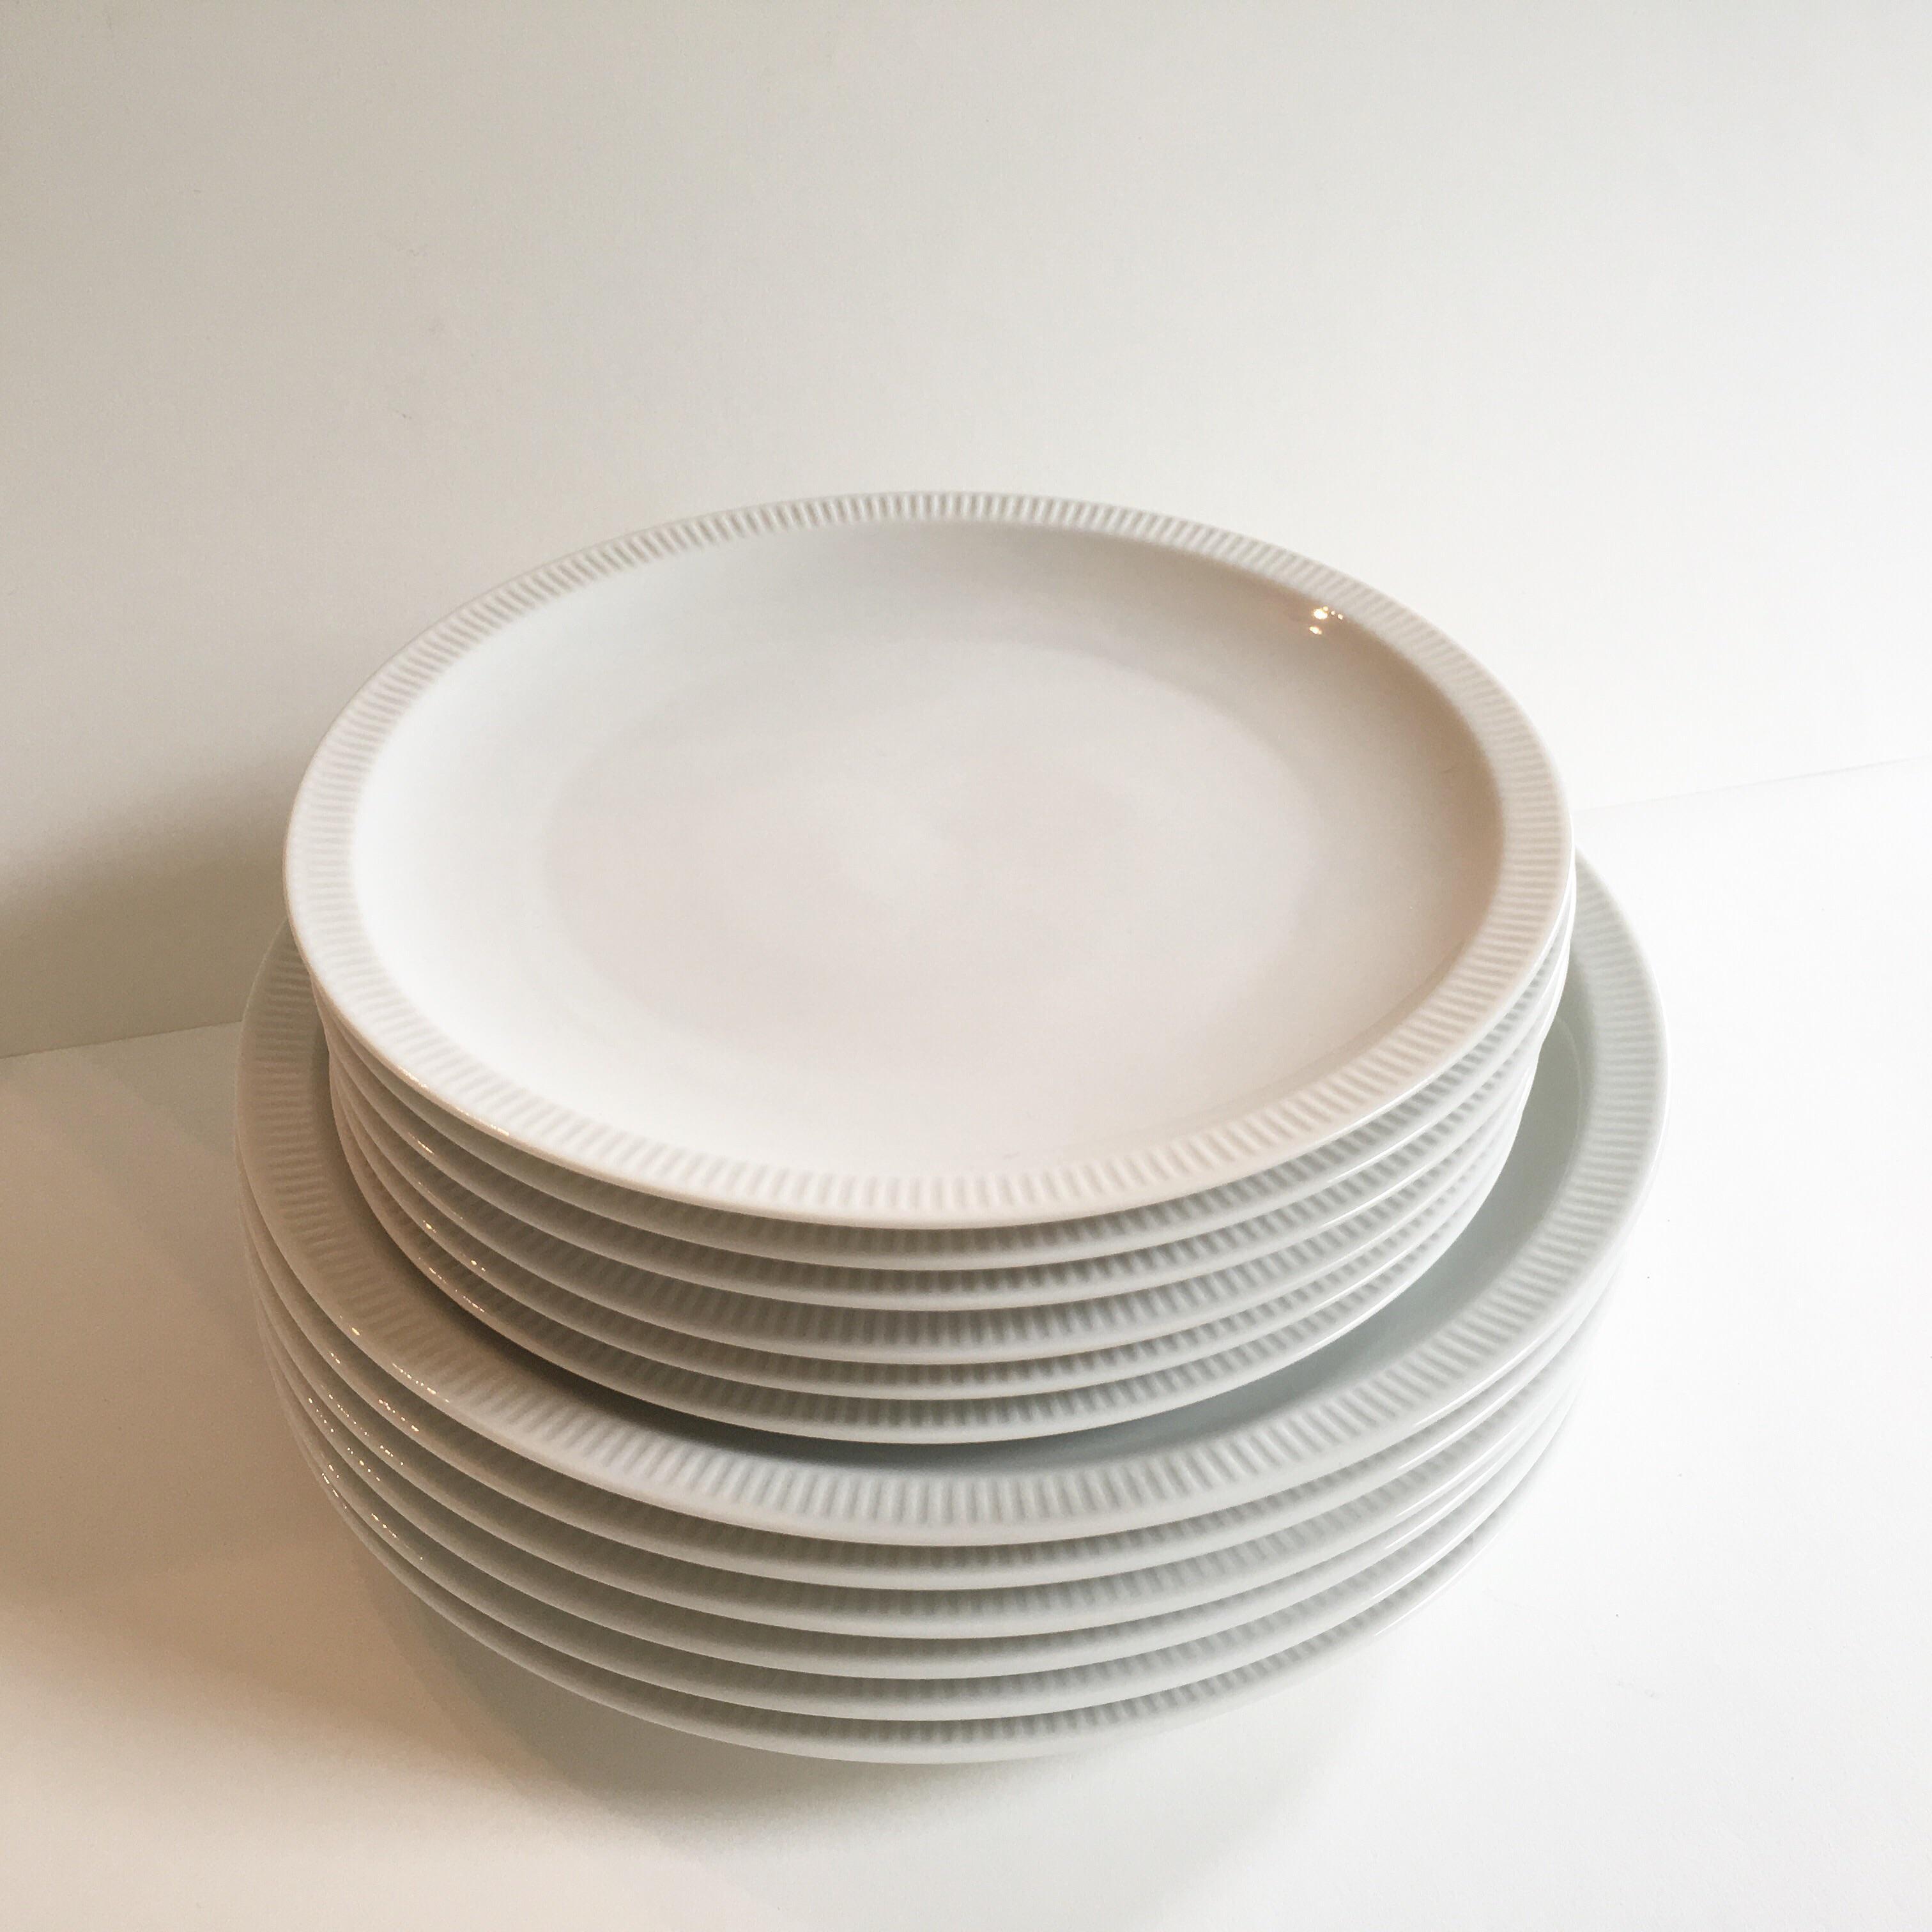 Mid-Century Arzberg u0027Athenau0027 Plates - Set of 12 - Image ... & Mid-Century Arzberg u0027Athenau0027 Plates - Set of 12 | Chairish